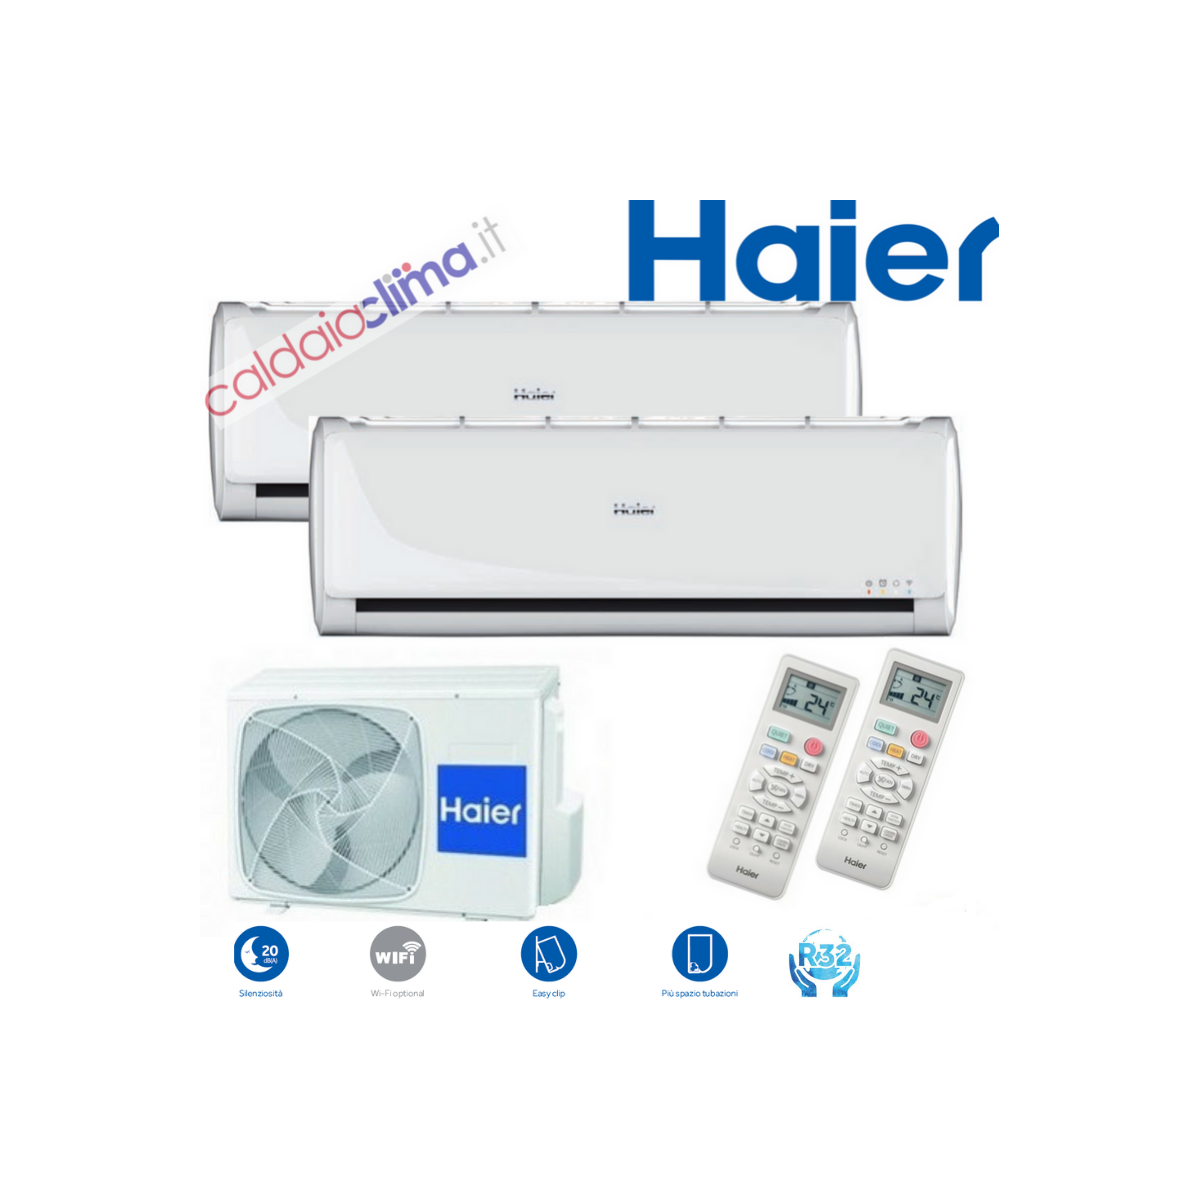 Climatizzatore Haier Dualsplit TUNDRA 2.0 2U40 - 9000+9000 btu